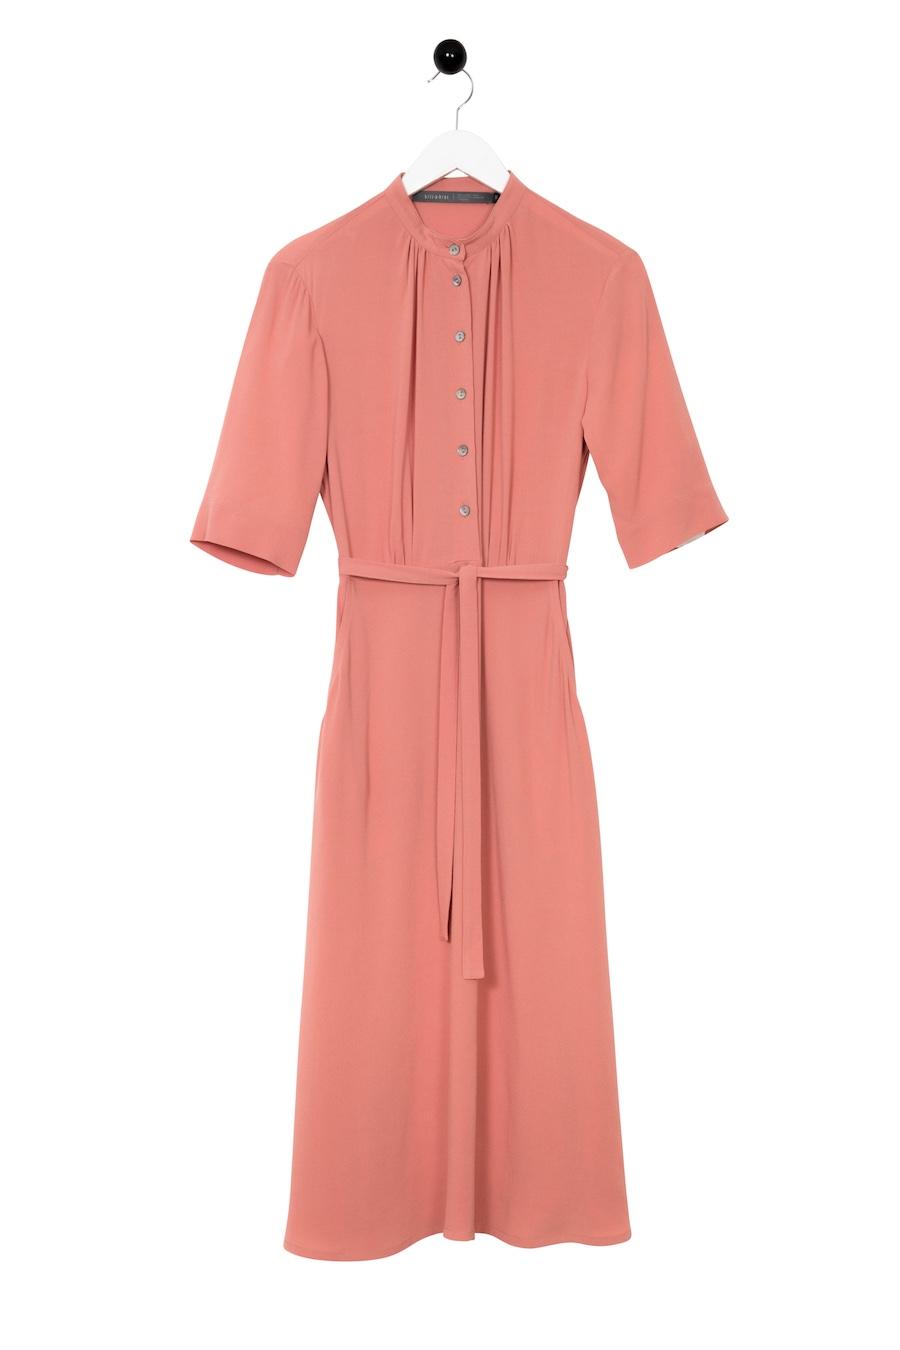 Pistage Dress